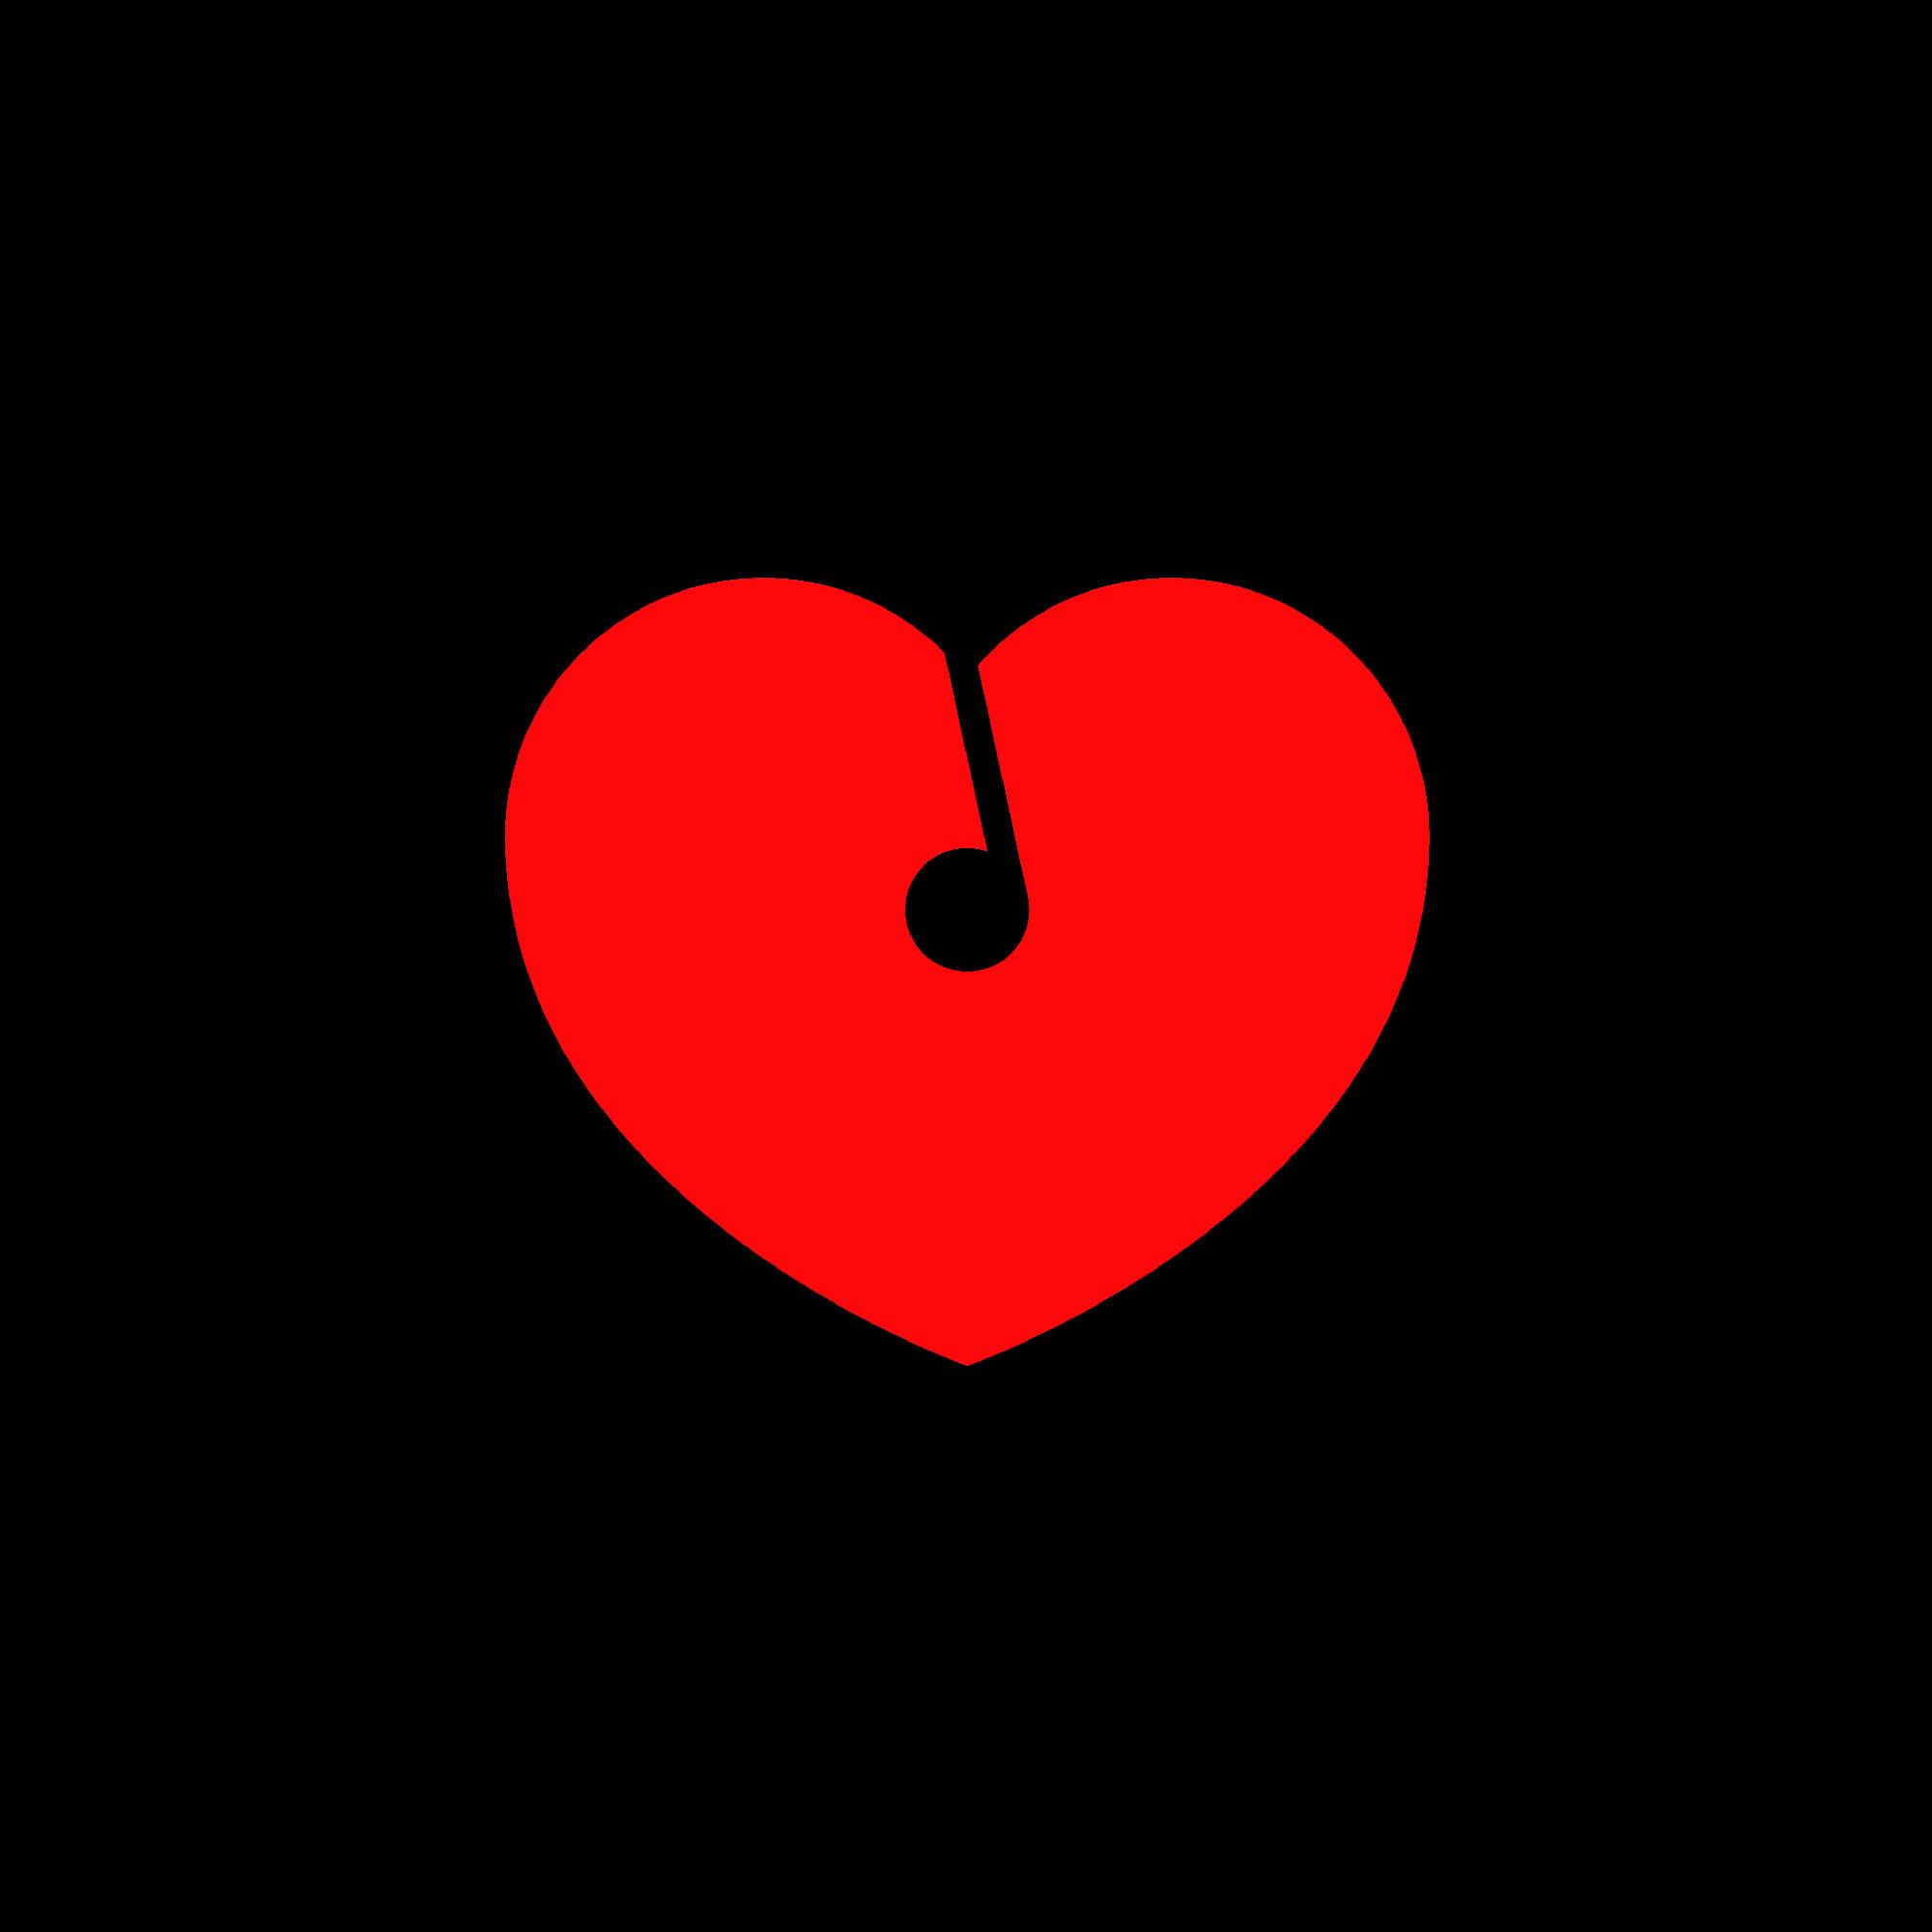 red heart with black background 39 images. Black Bedroom Furniture Sets. Home Design Ideas